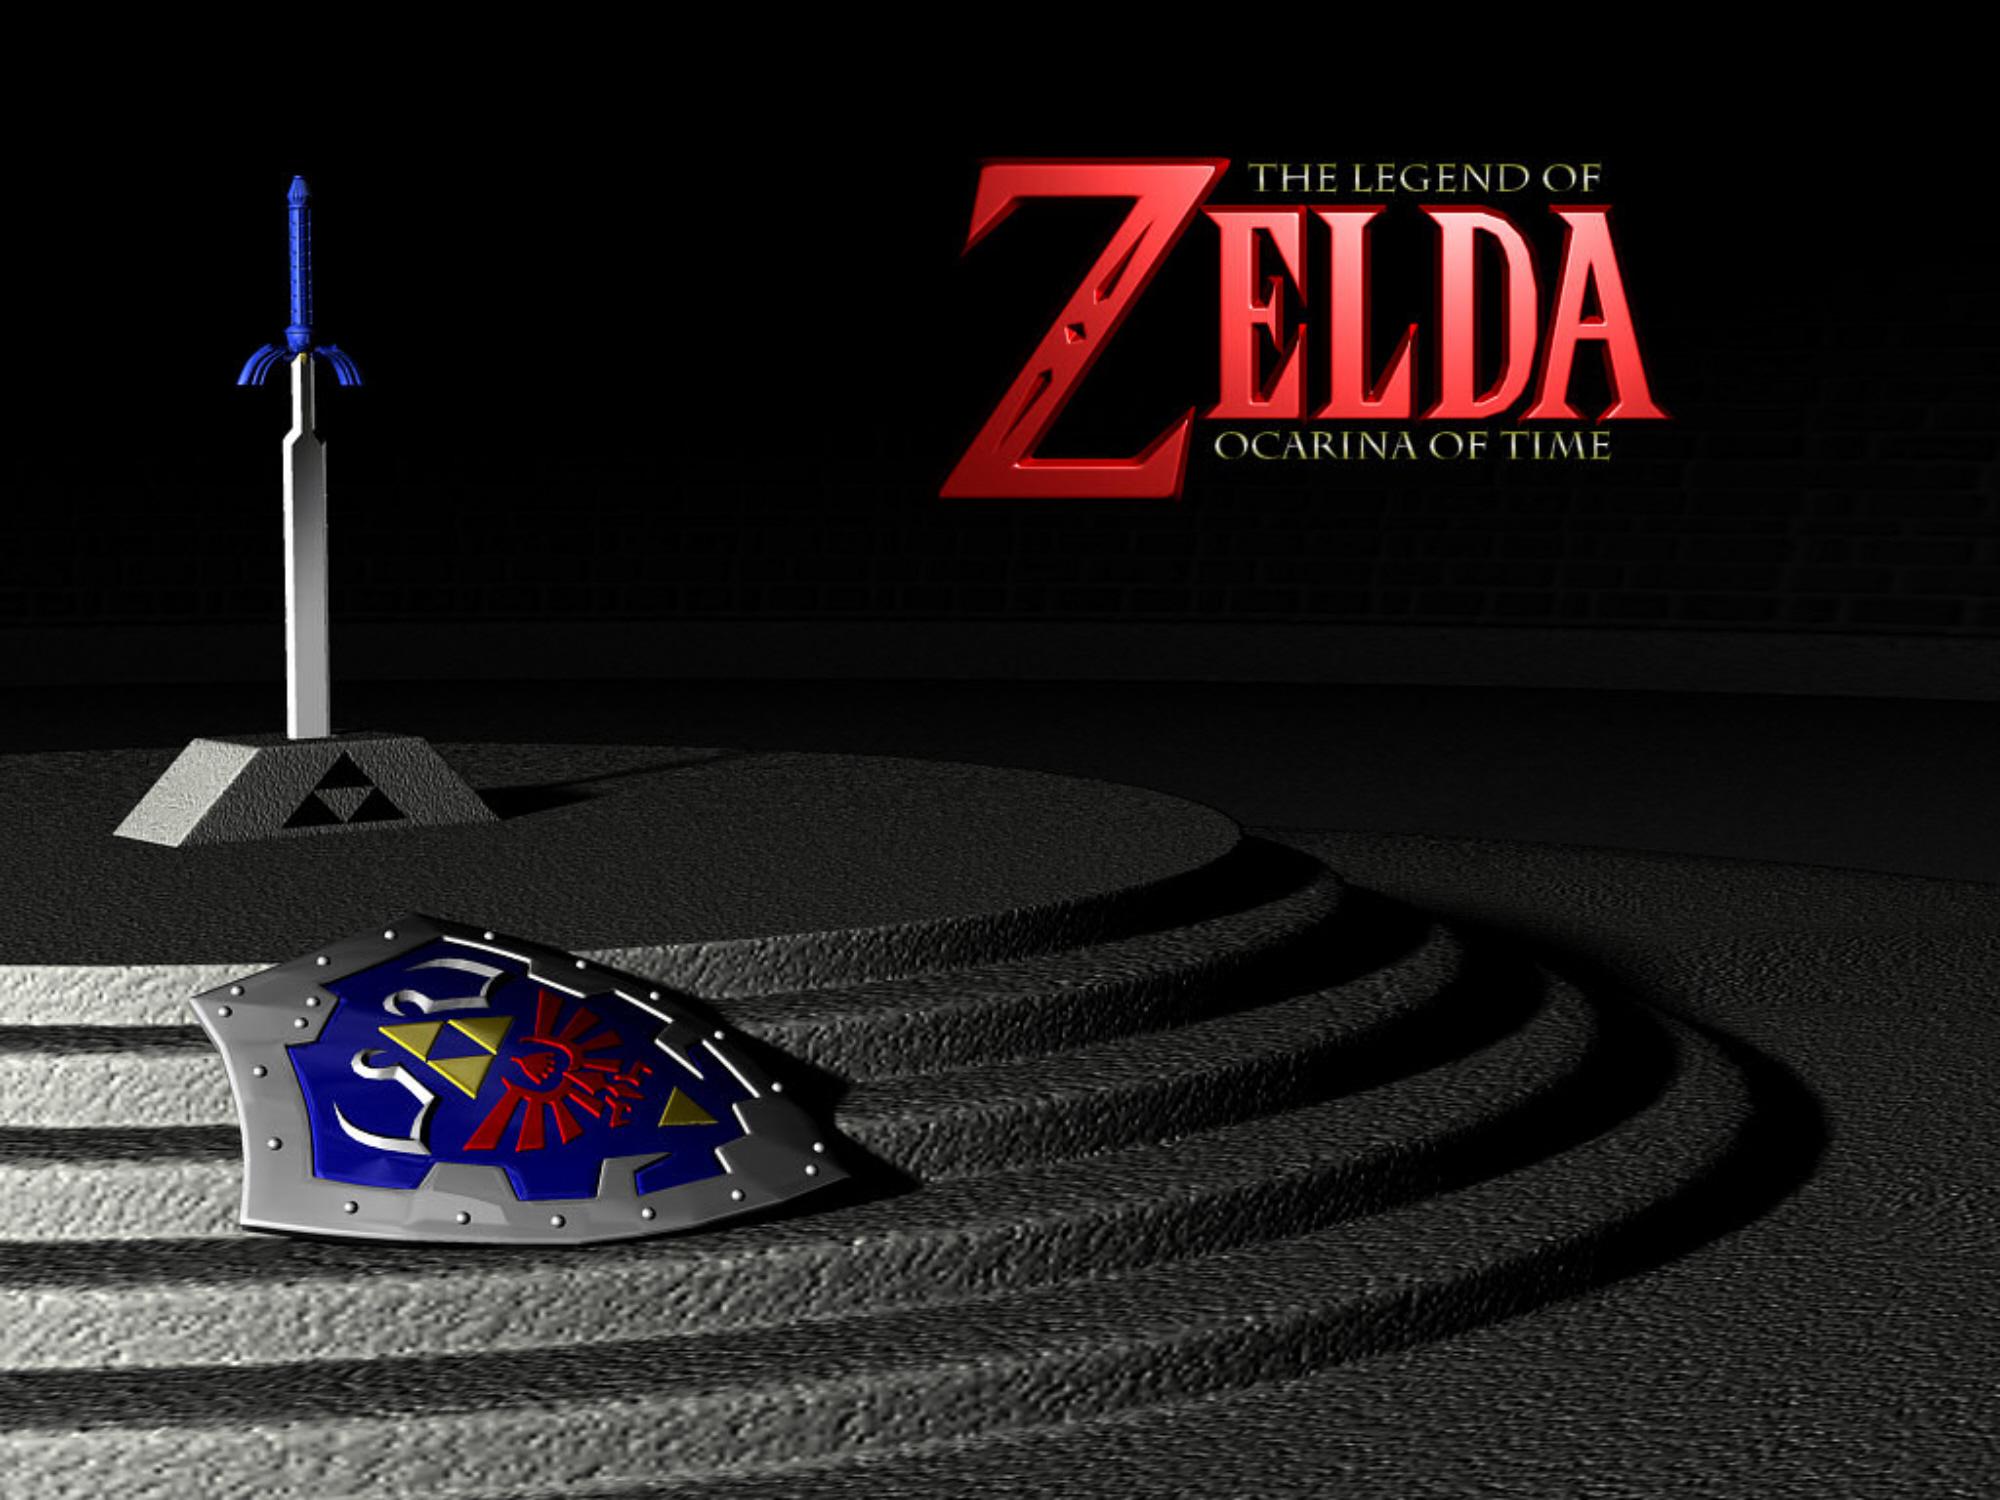 The Legend Of Zelda Ocarina Of Time 3d Wallpaper